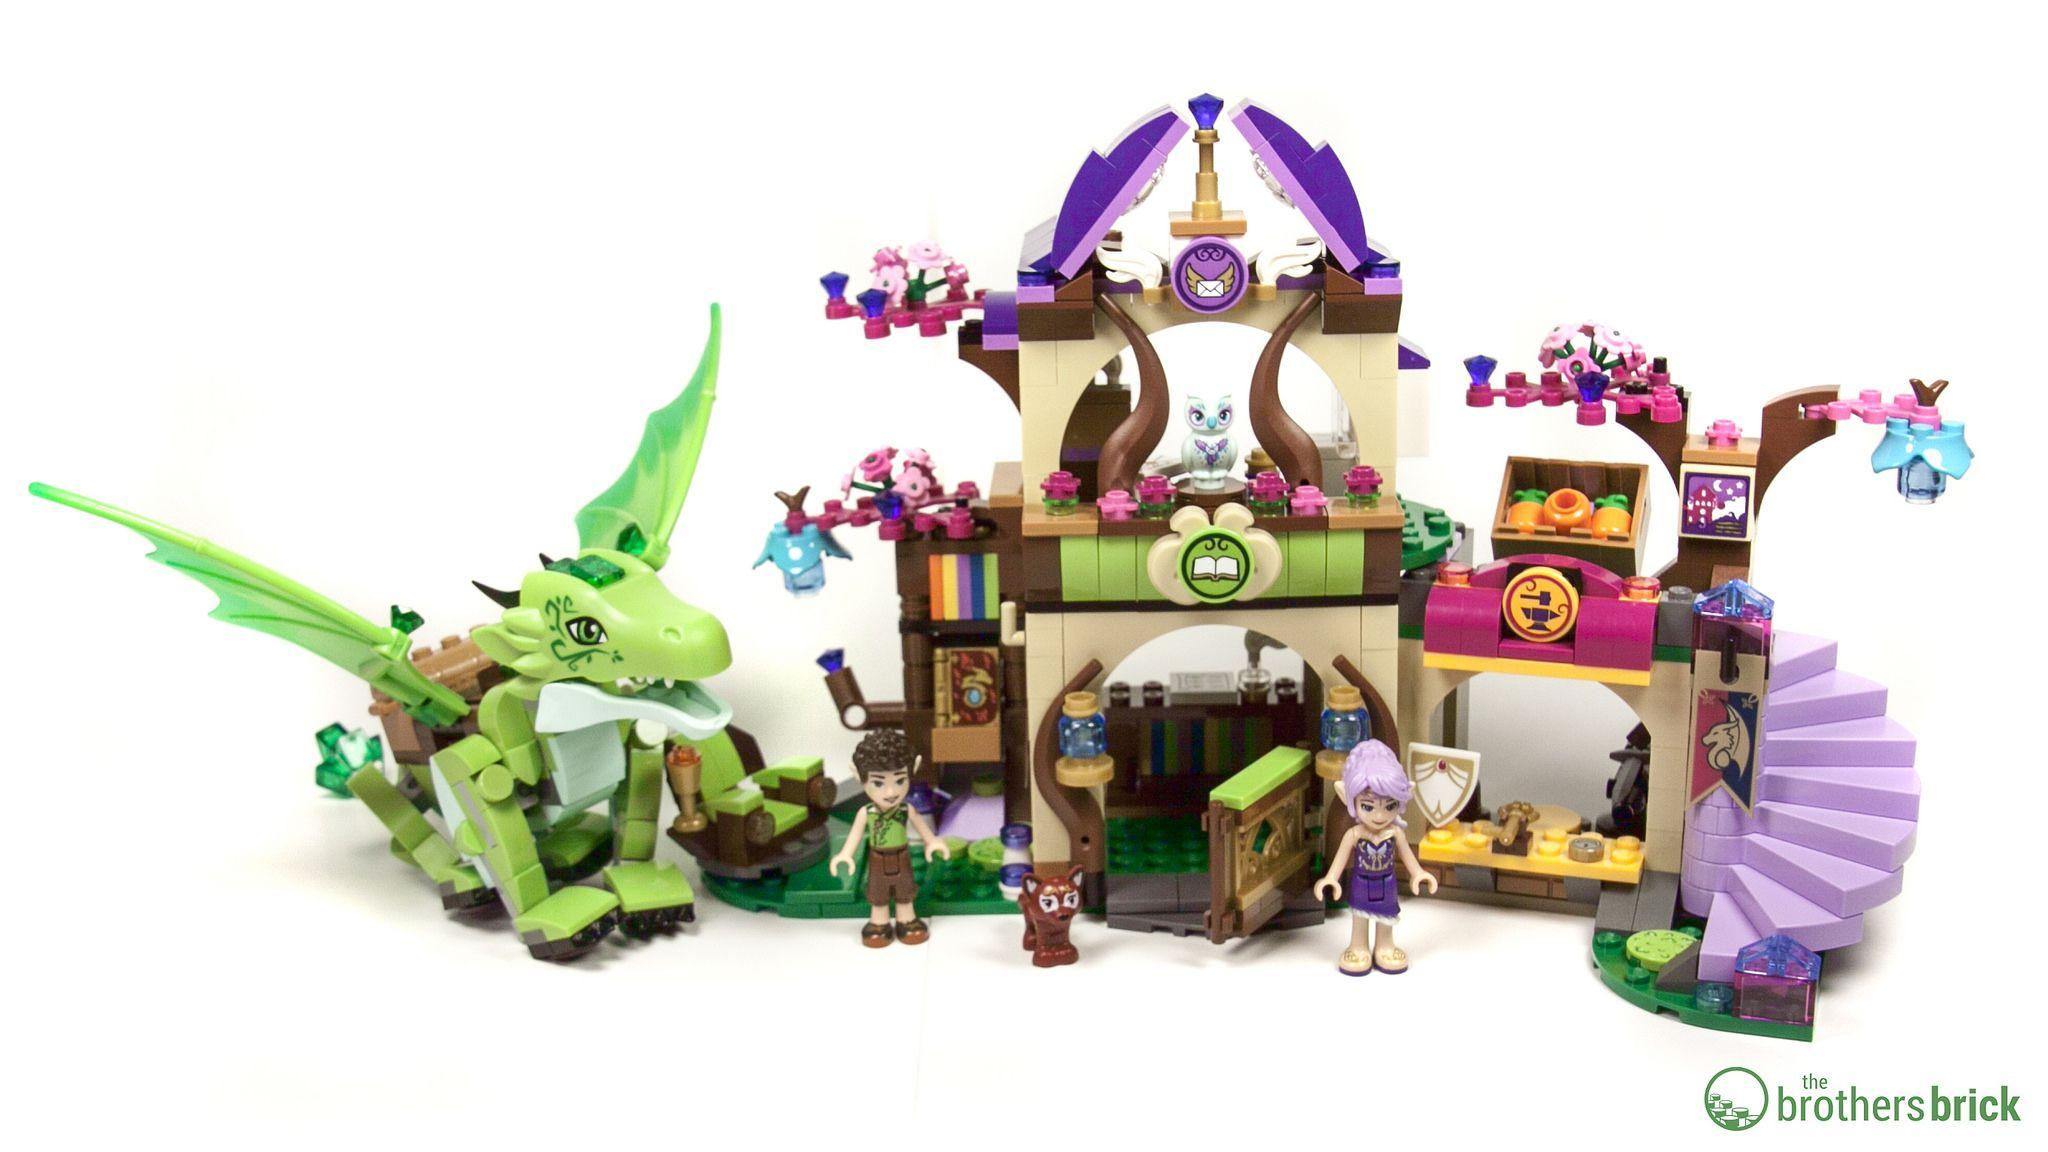 New Lego Instruction Manual ONLY for Elves The Secret Marketplace Set 41176